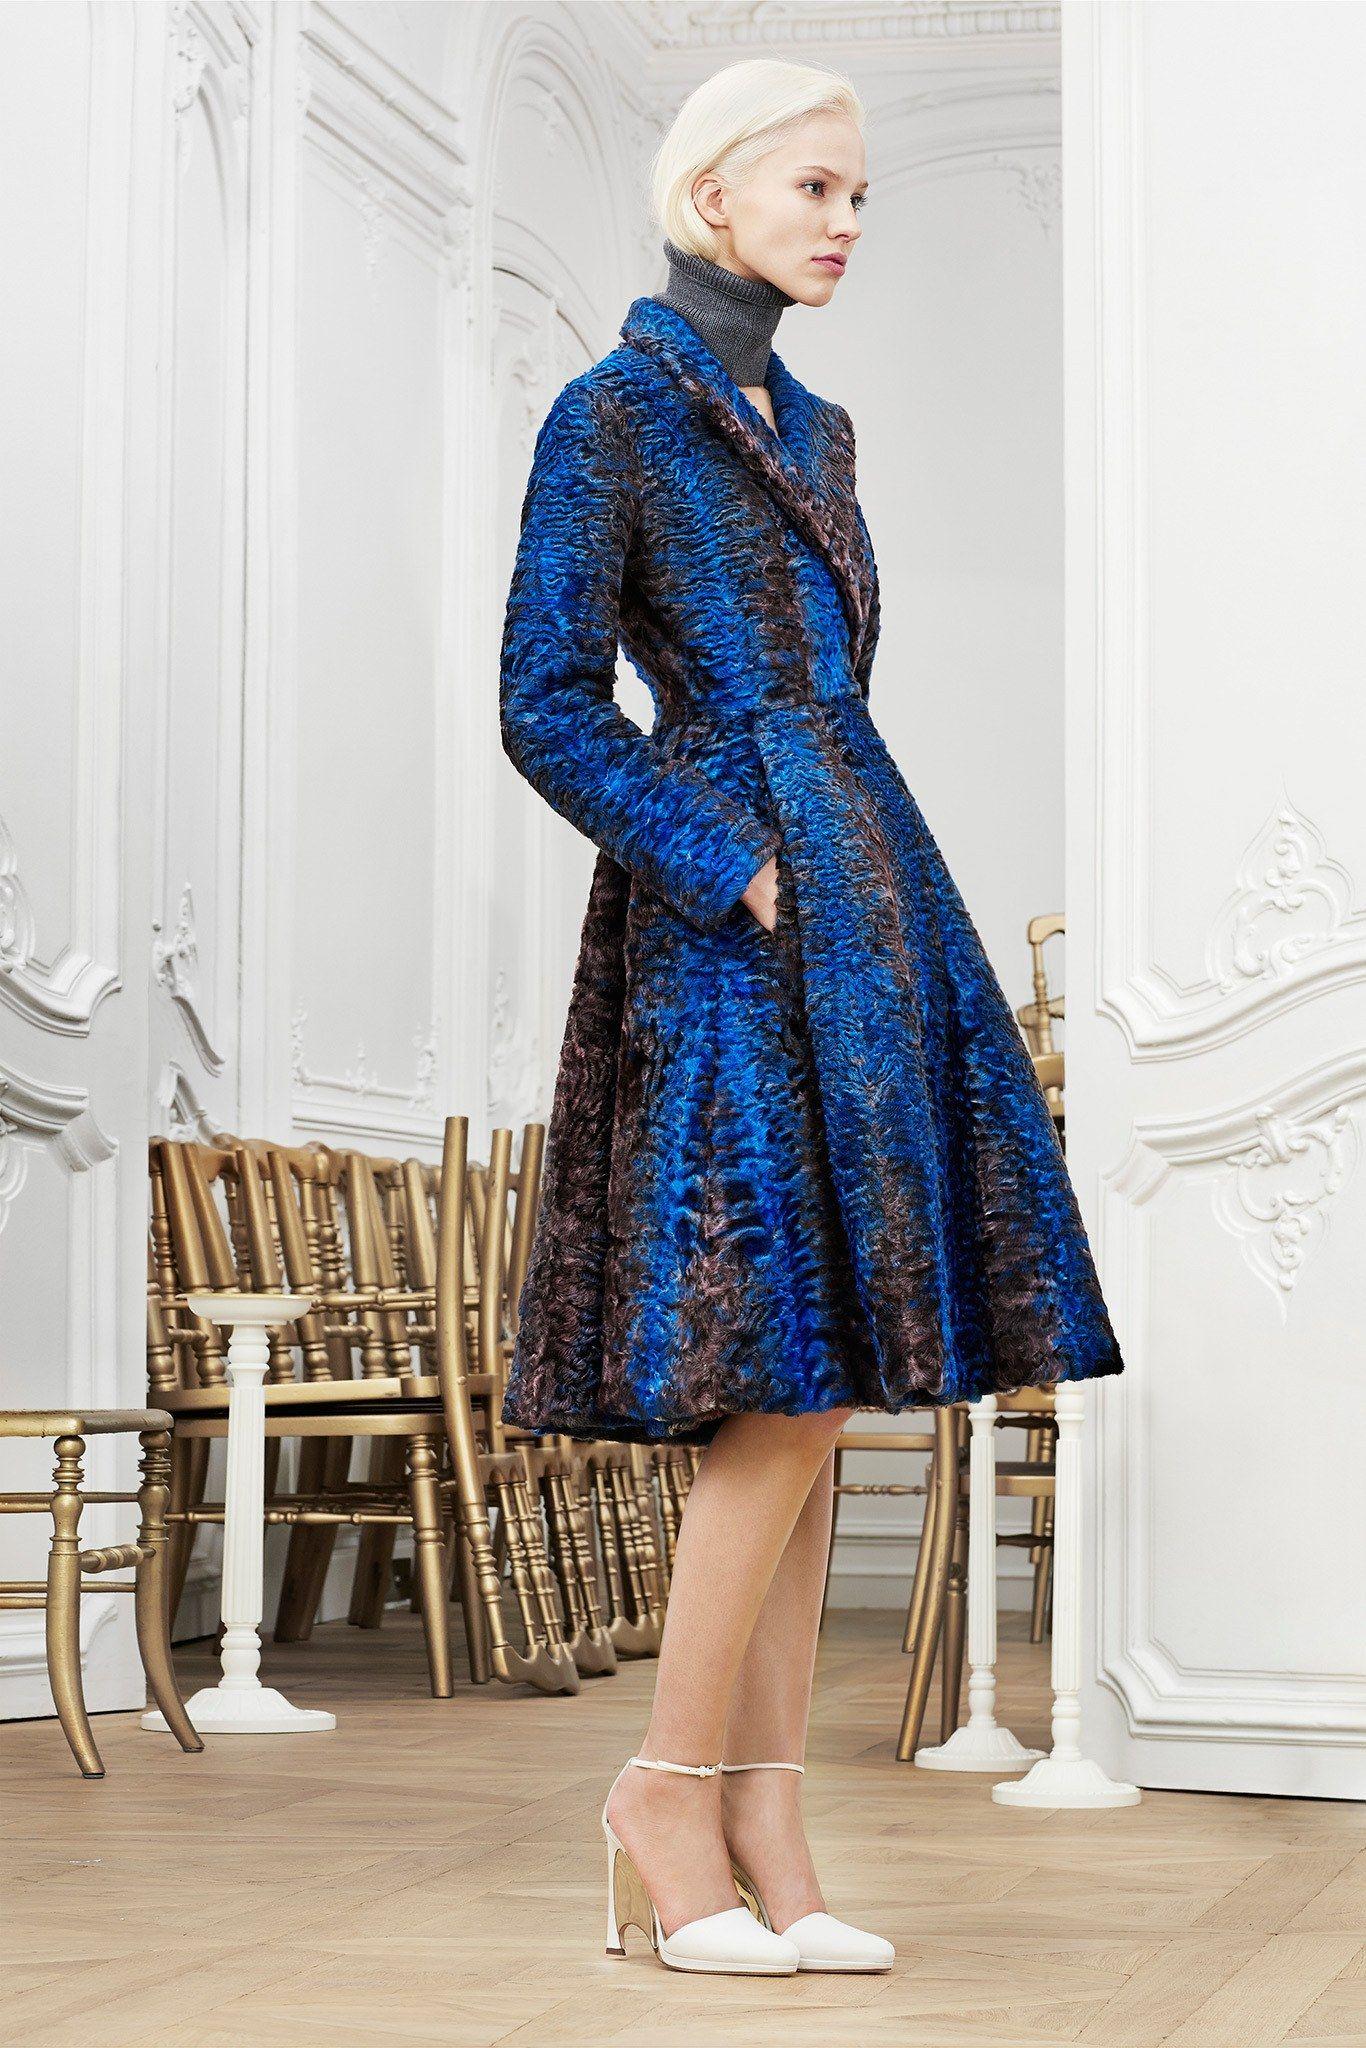 6040d957dea10 Sasha Luss for Dior Pre Fall 2014 Lookbook